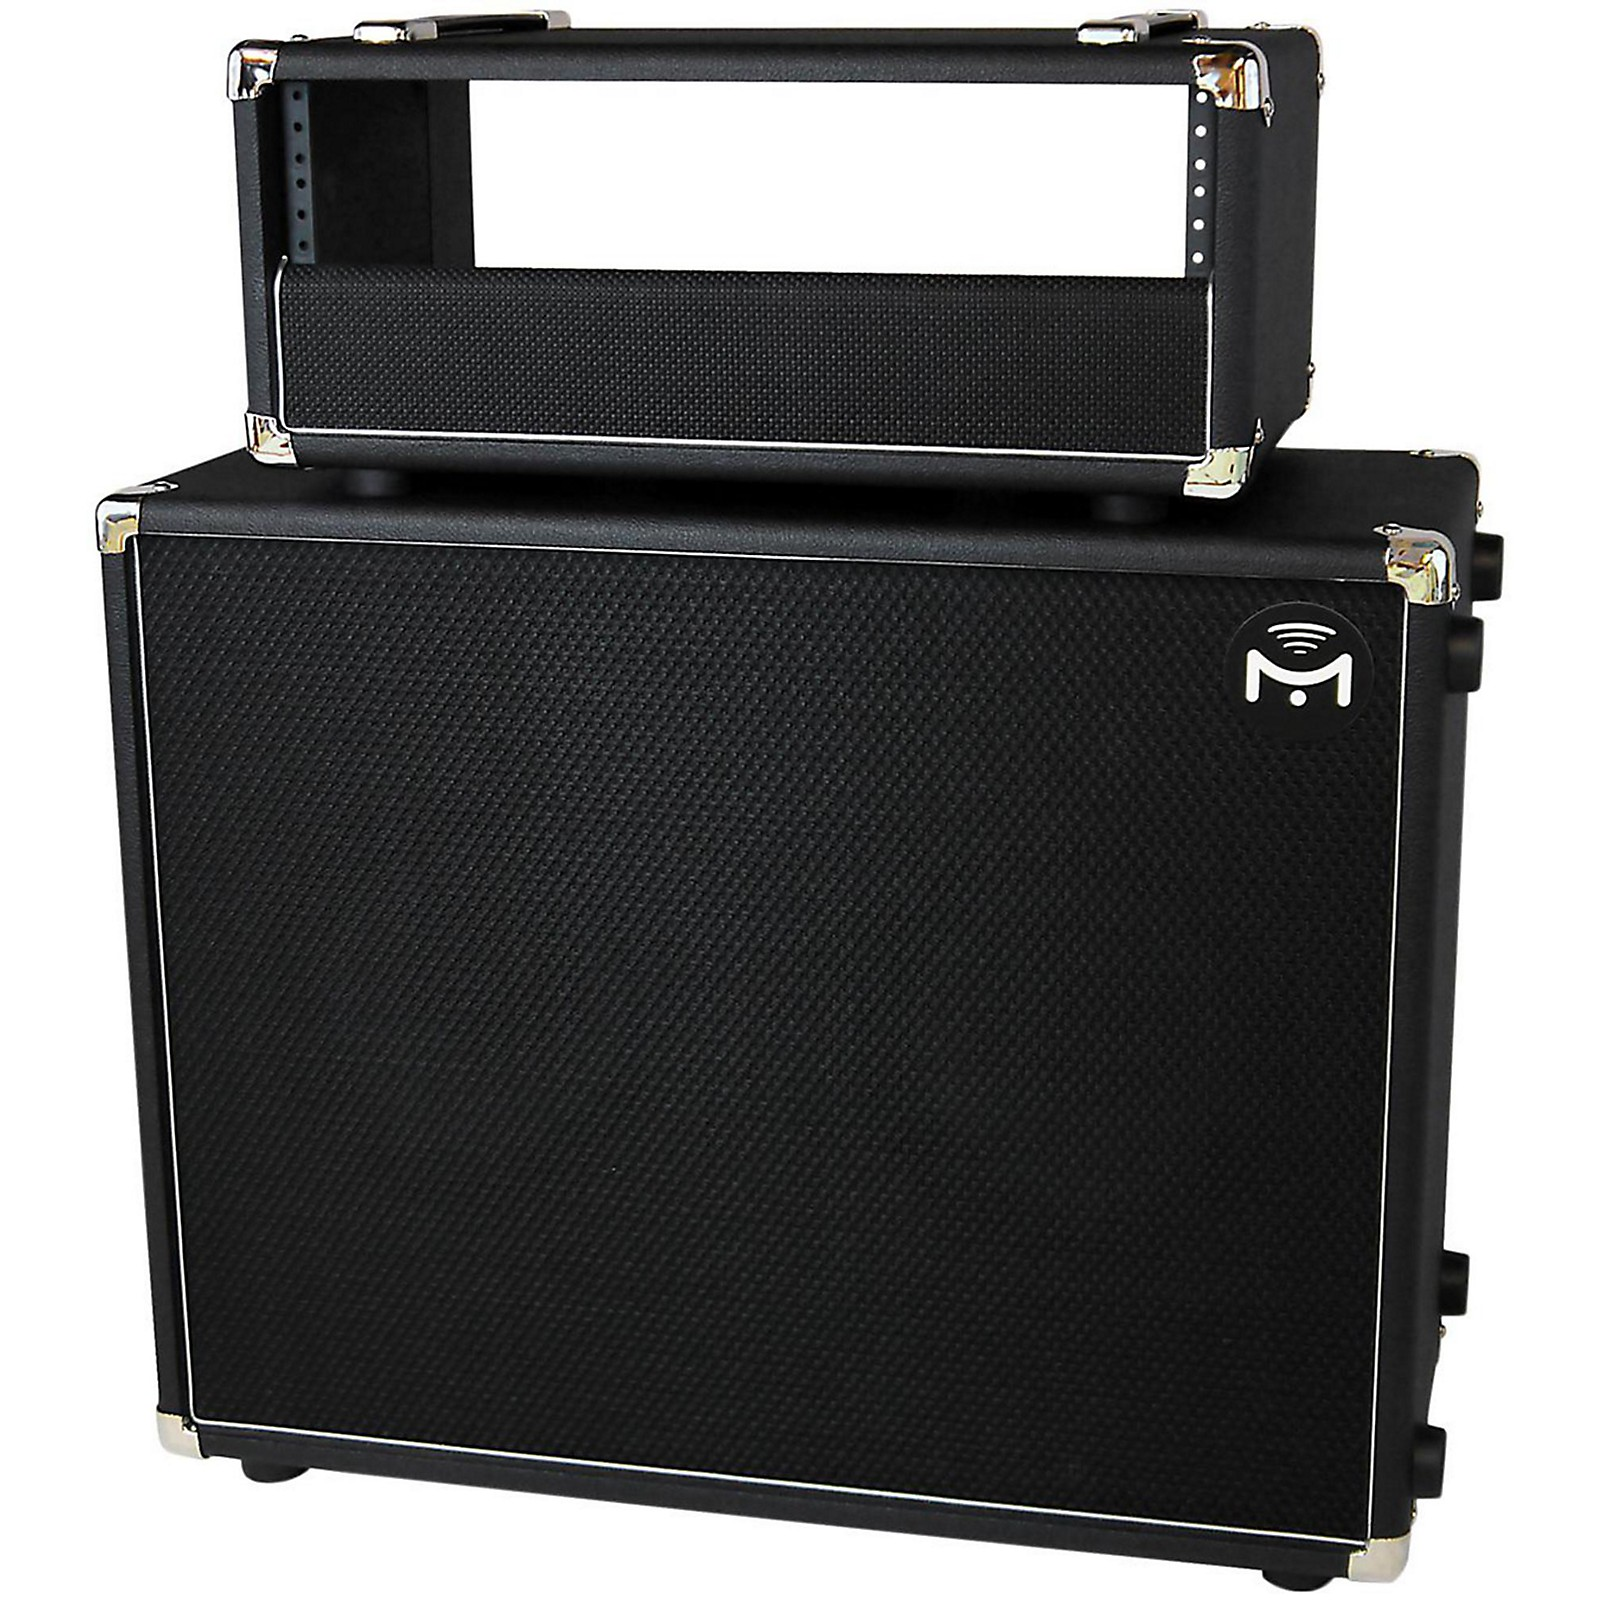 Mission Engineering Gemini GM-HS Guitar Head Unit with GM2 2x12 220W Cab